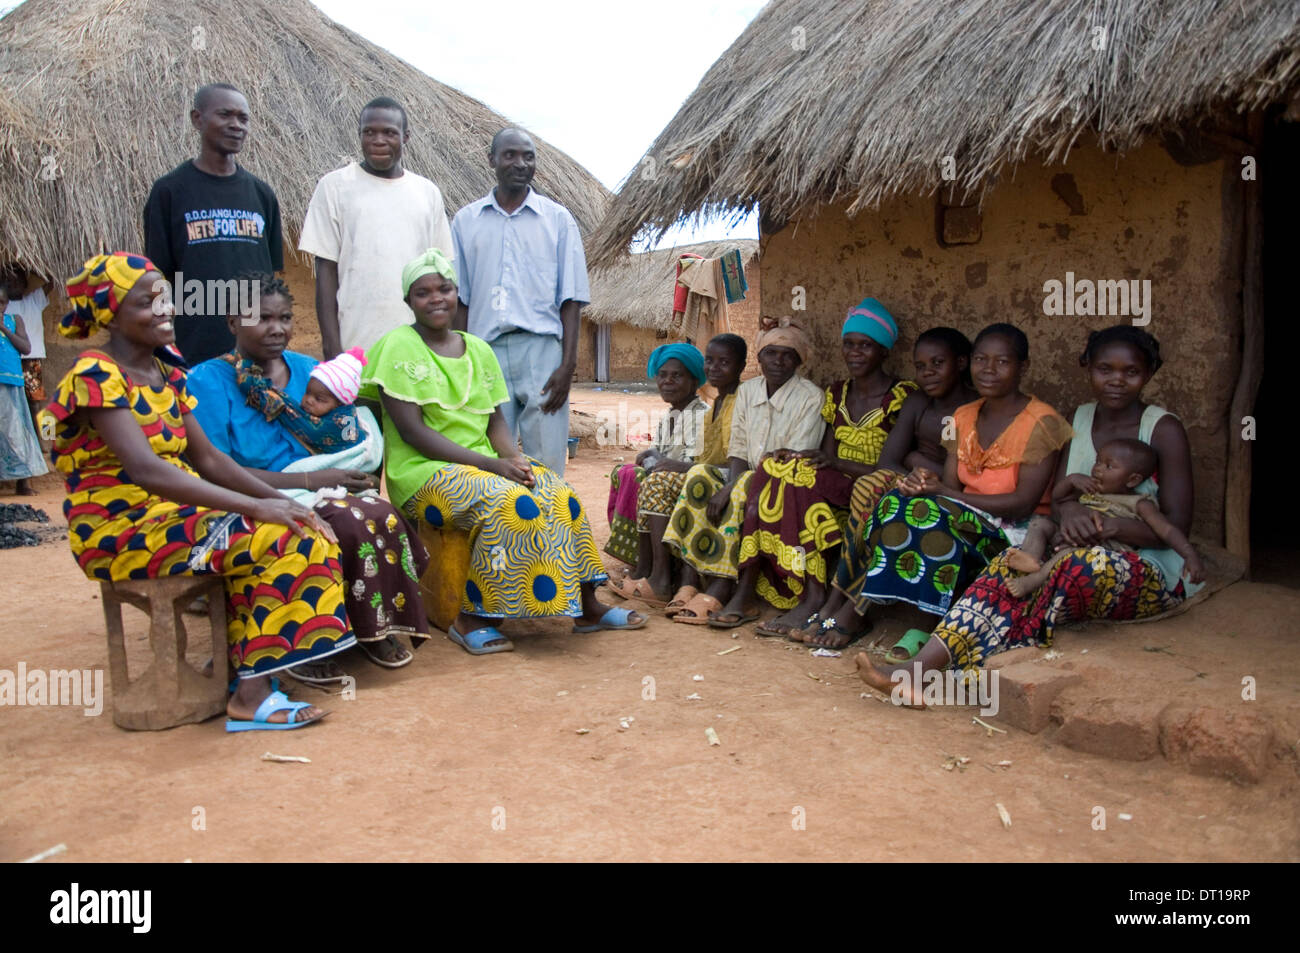 malaria clubs meet to educate communities regarding malaria Stock Photo